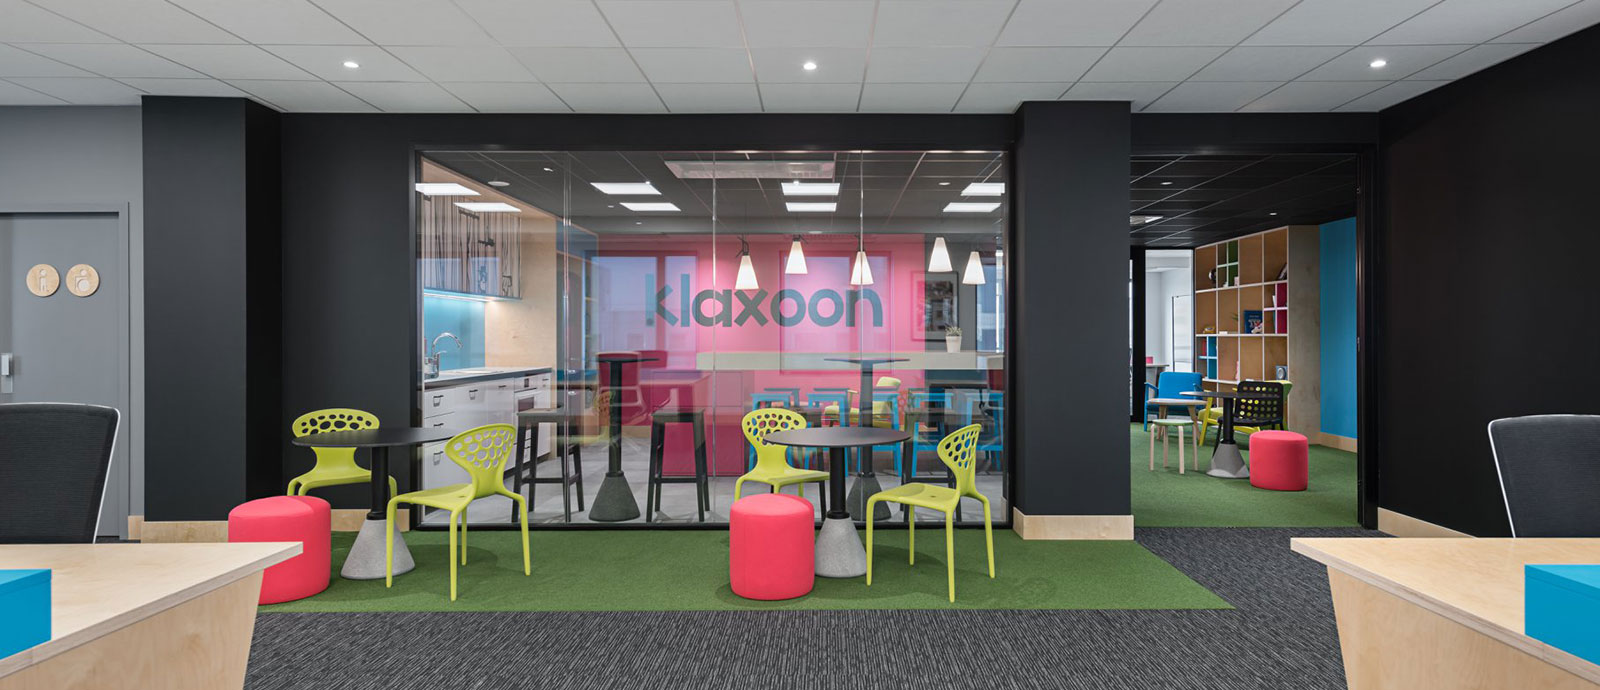 Klaxoon Station